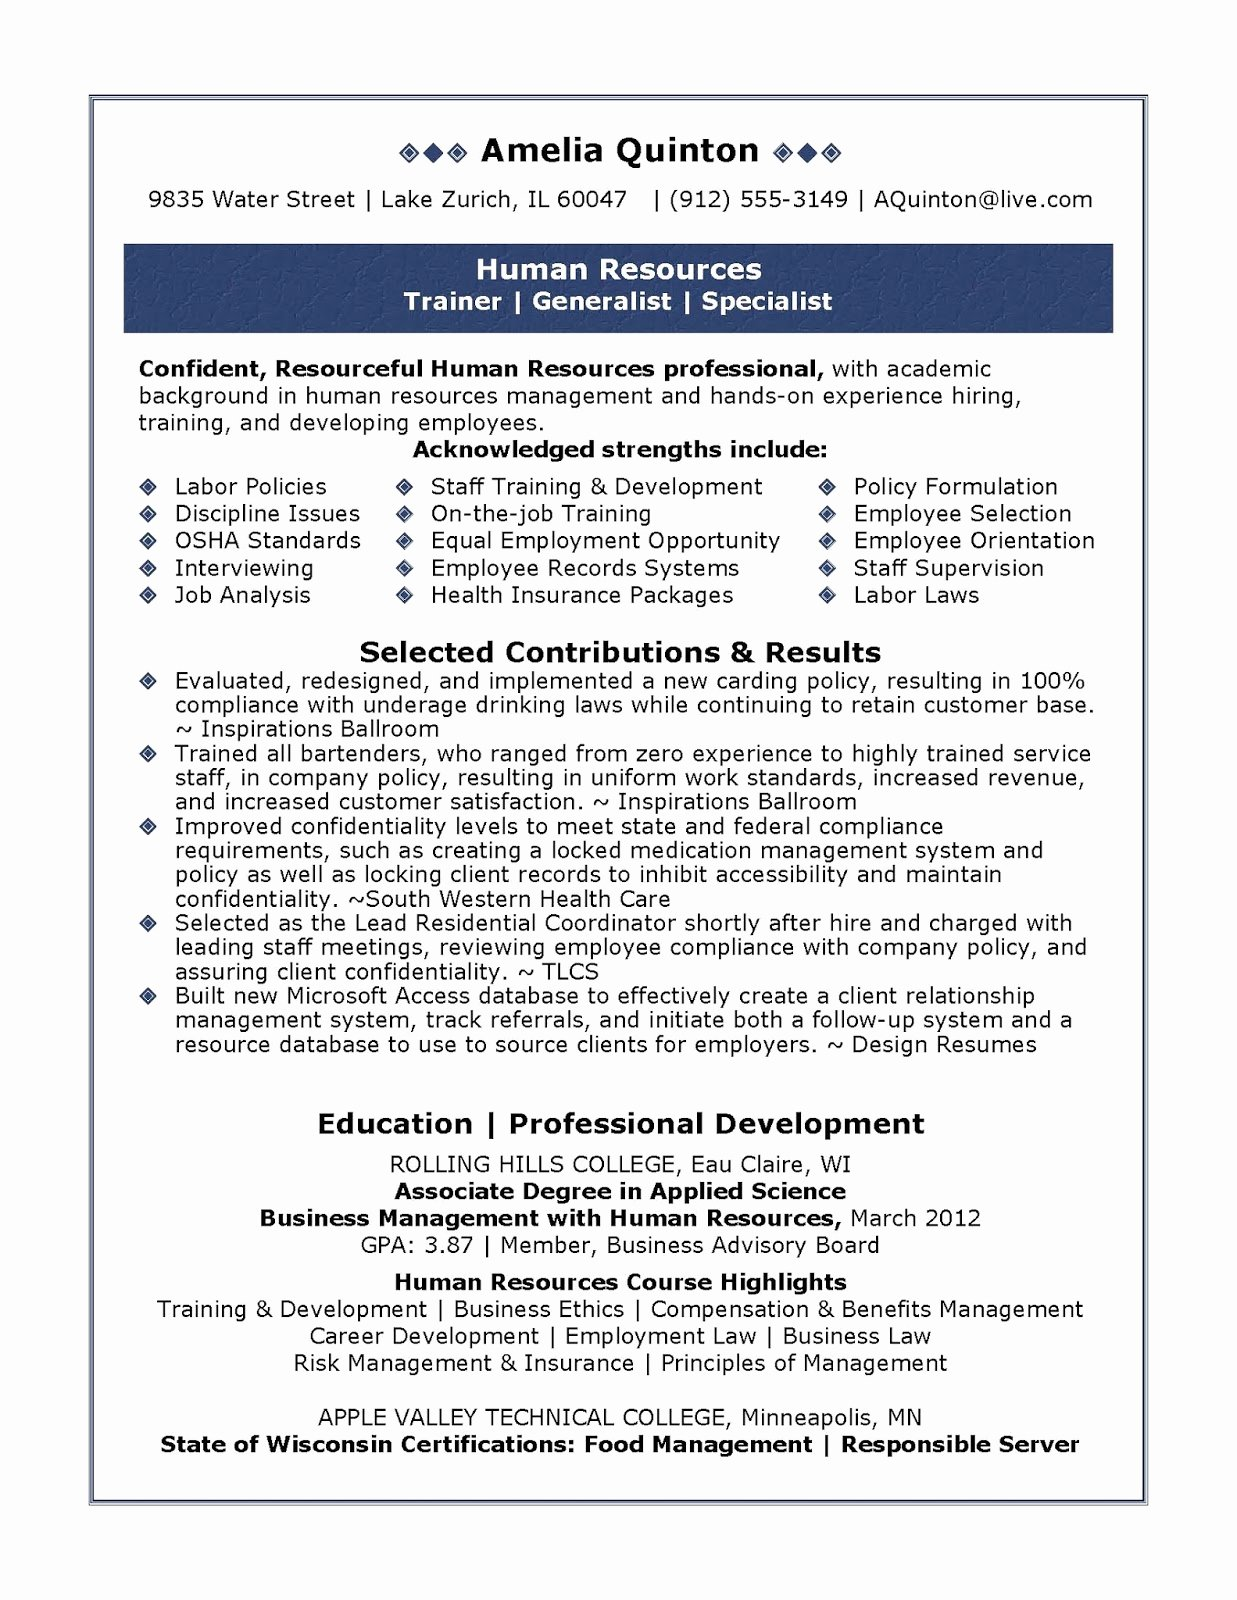 Sample Human Resources Resume